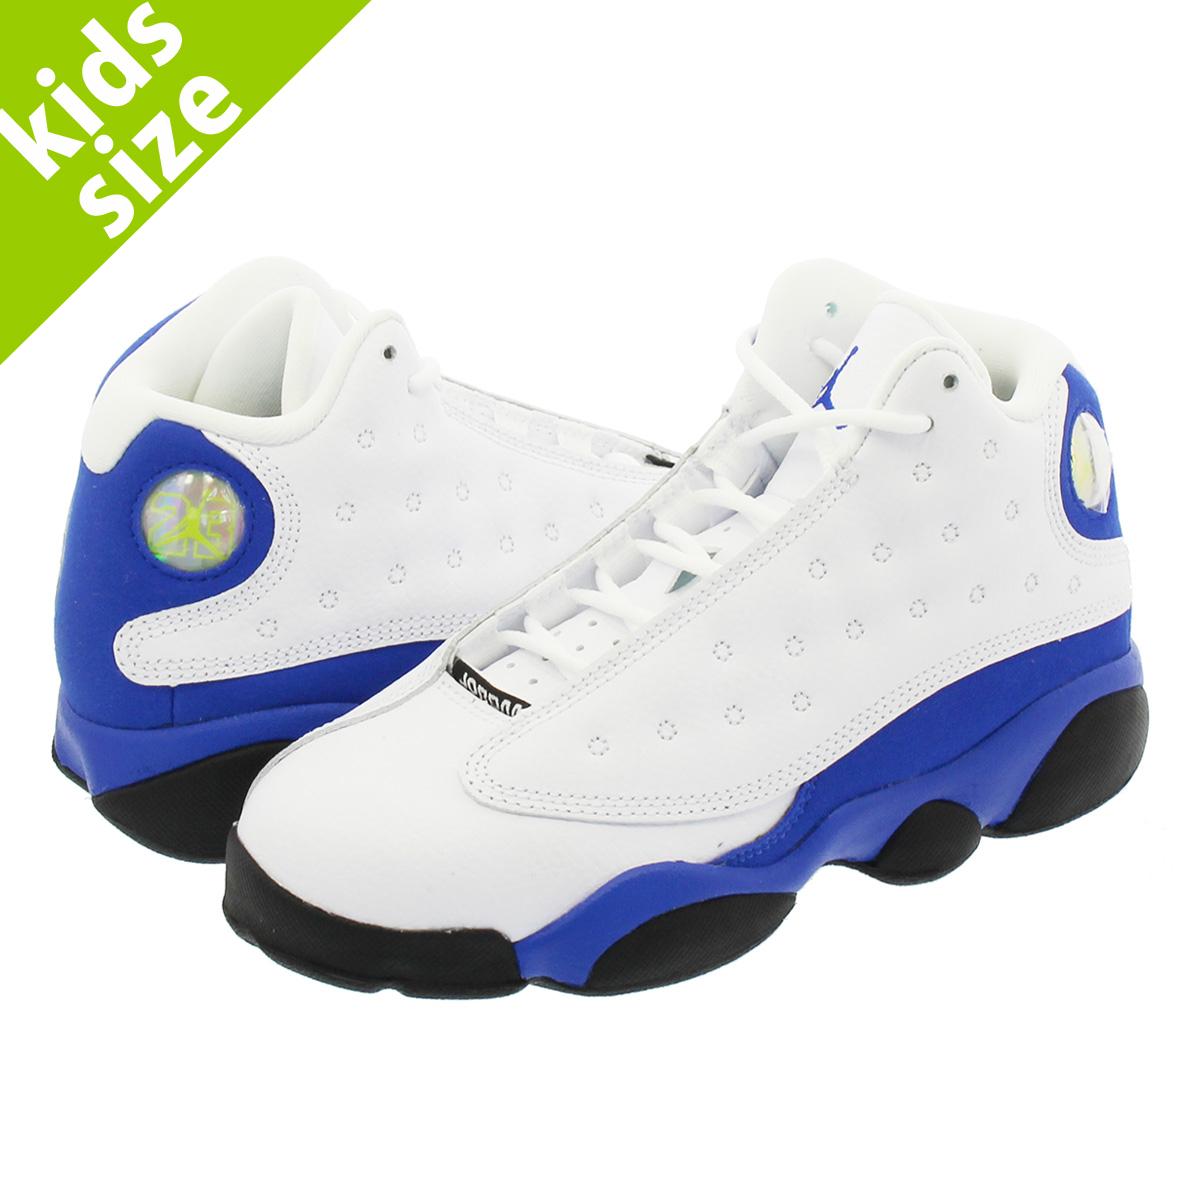 sneakers for cheap 0fb26 7d7ce NIKE AIR JORDAN 13 RETRO BP Nike Air Jordan 13 nostalgic BP WHITE/HYPER  ROYAL/BLACK 414,575-117